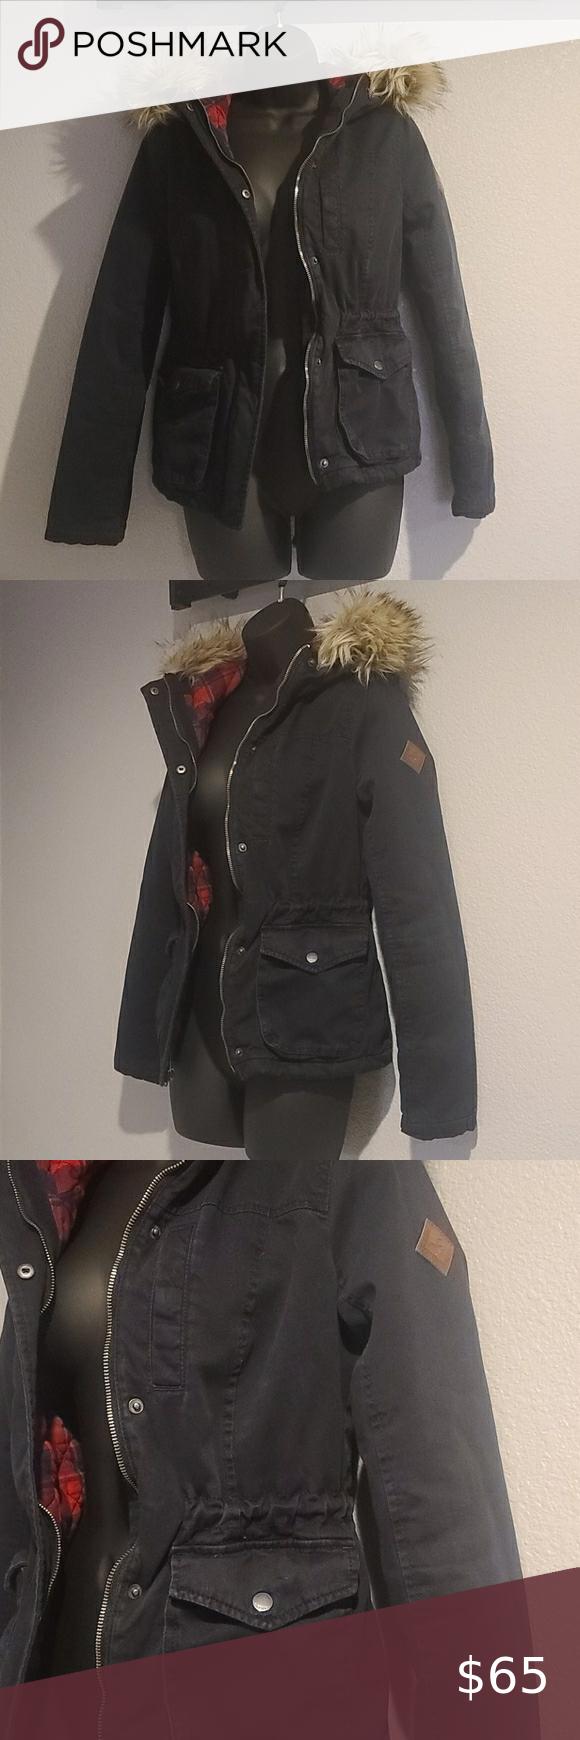 Hollister Winter Coat Coats Jackets Women All Weather Jackets Fall Utility Jacket [ 1740 x 580 Pixel ]